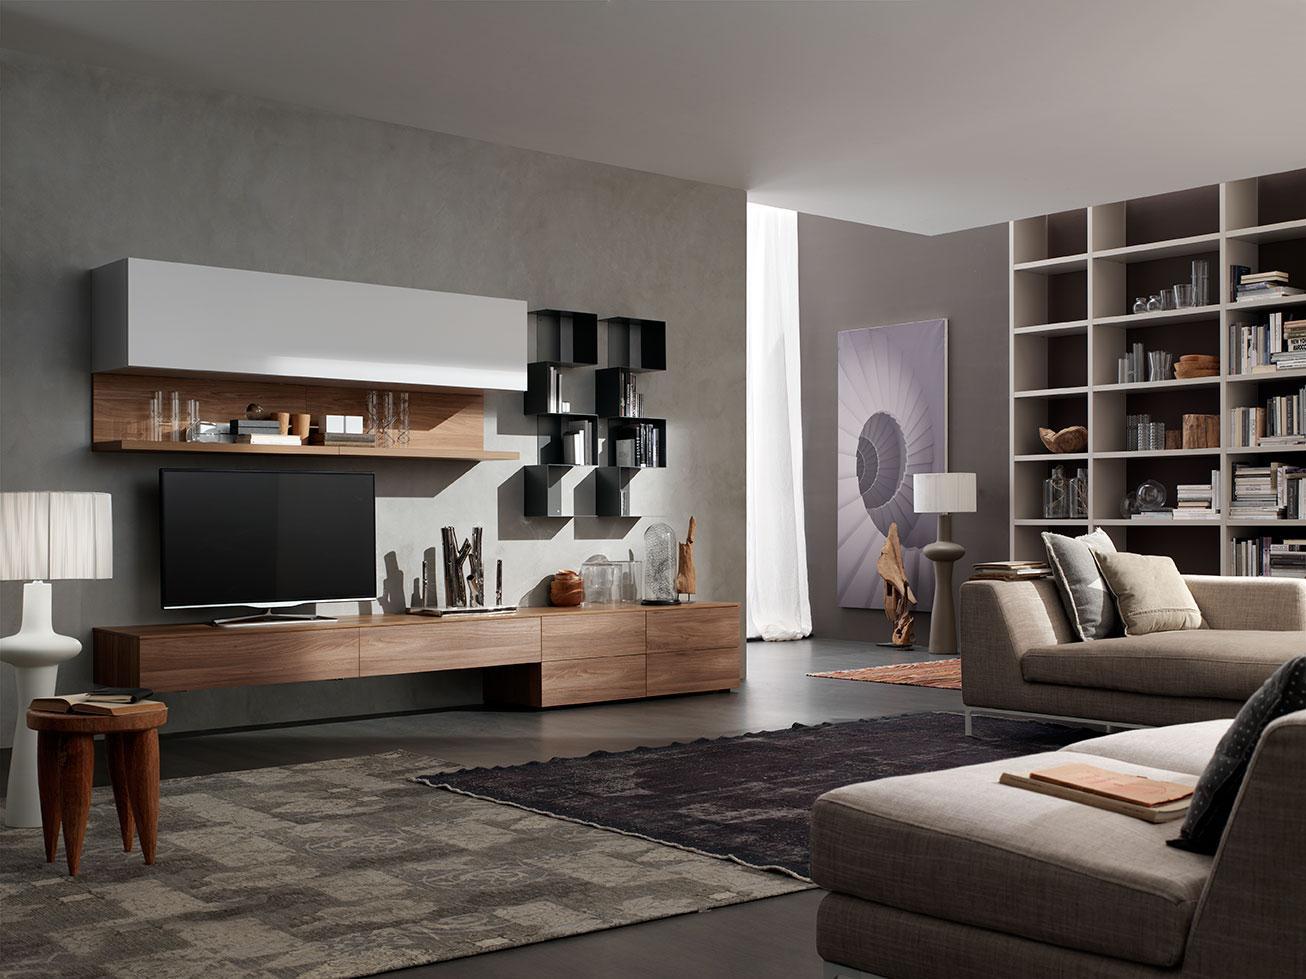 Zona living moderna s l integra catania for Zona living moderna